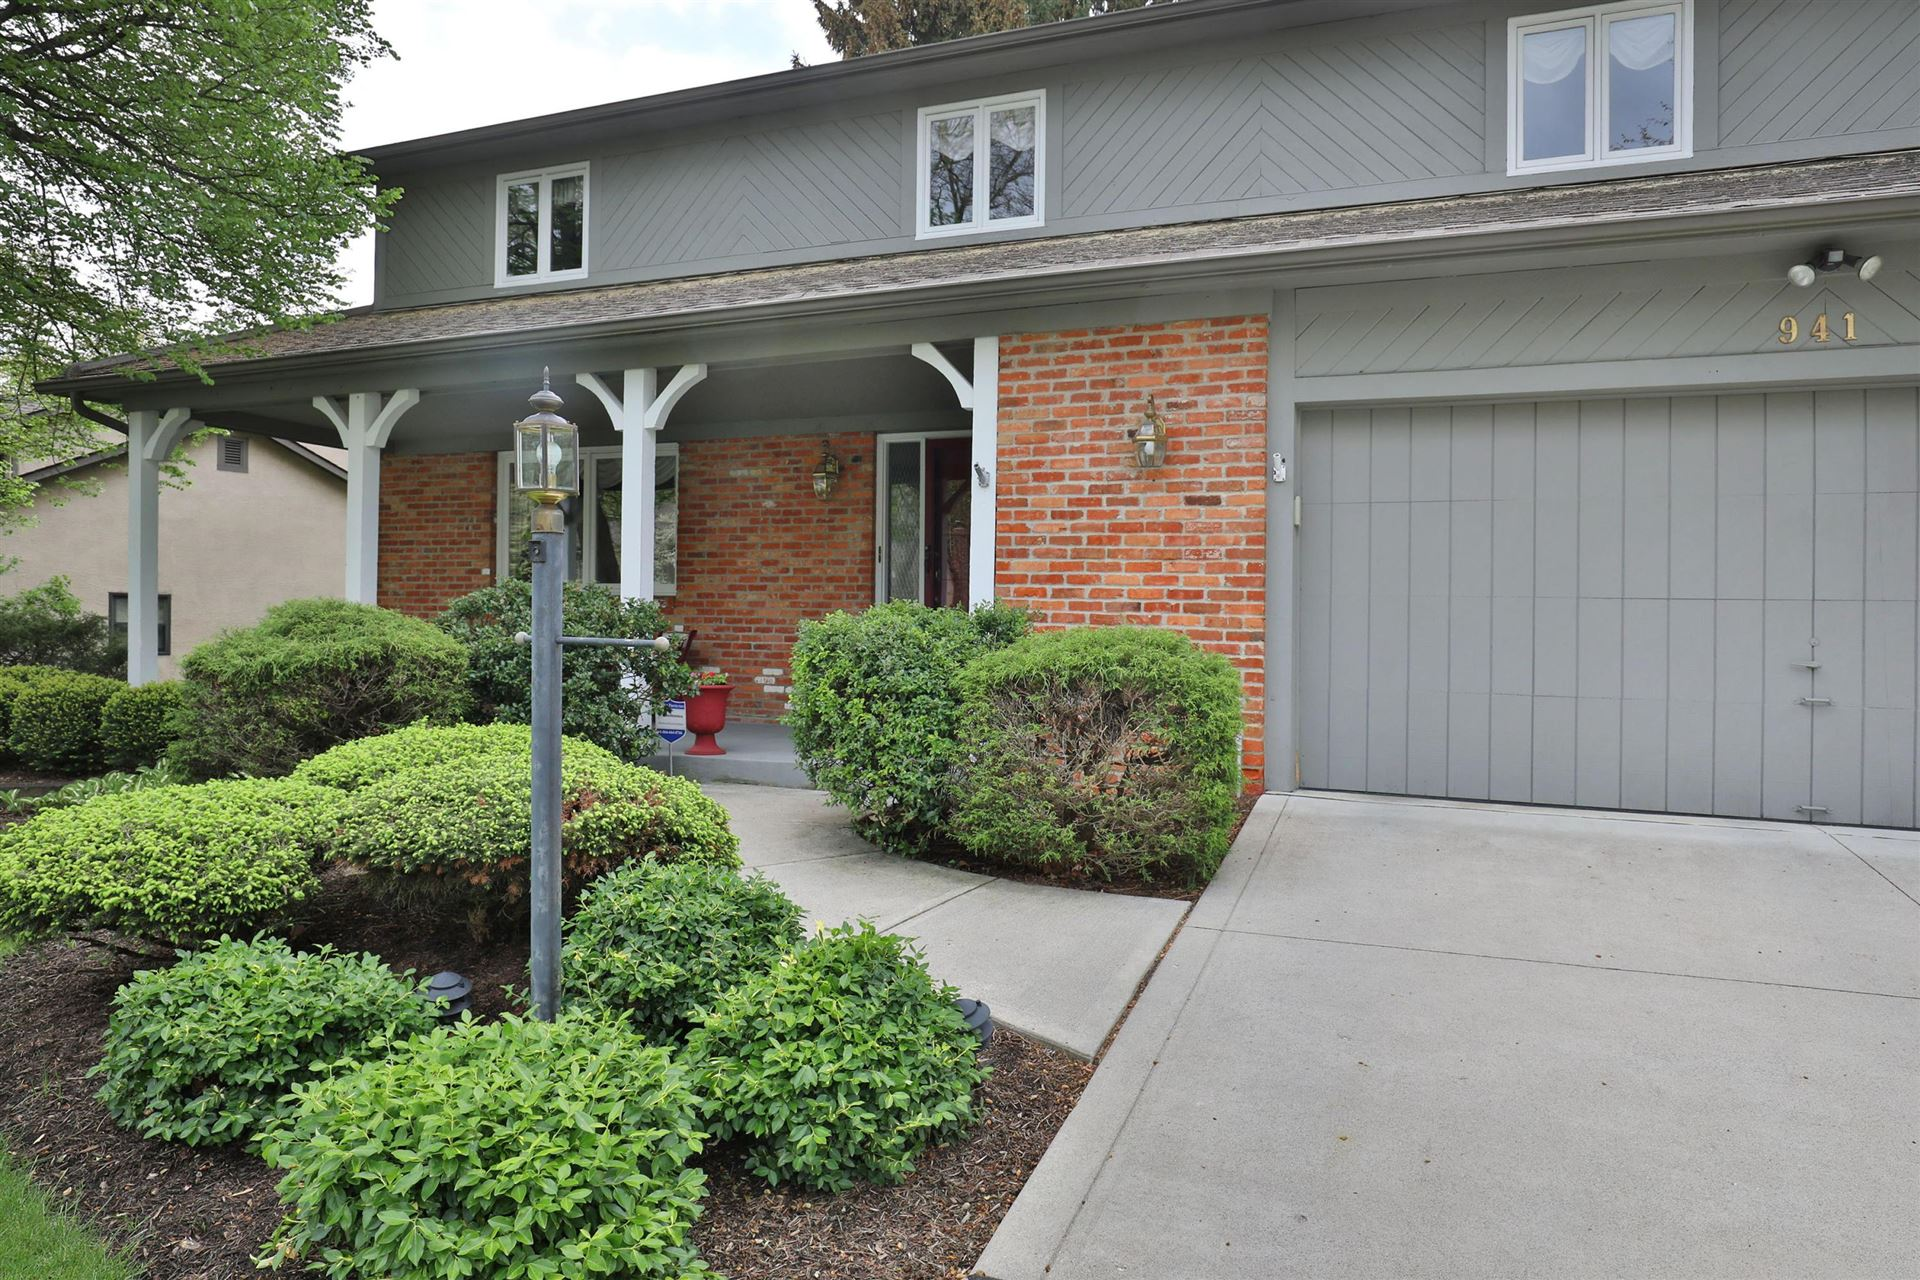 Photo of 941 Macgregor Avenue, Worthington, OH 43085 (MLS # 221014254)